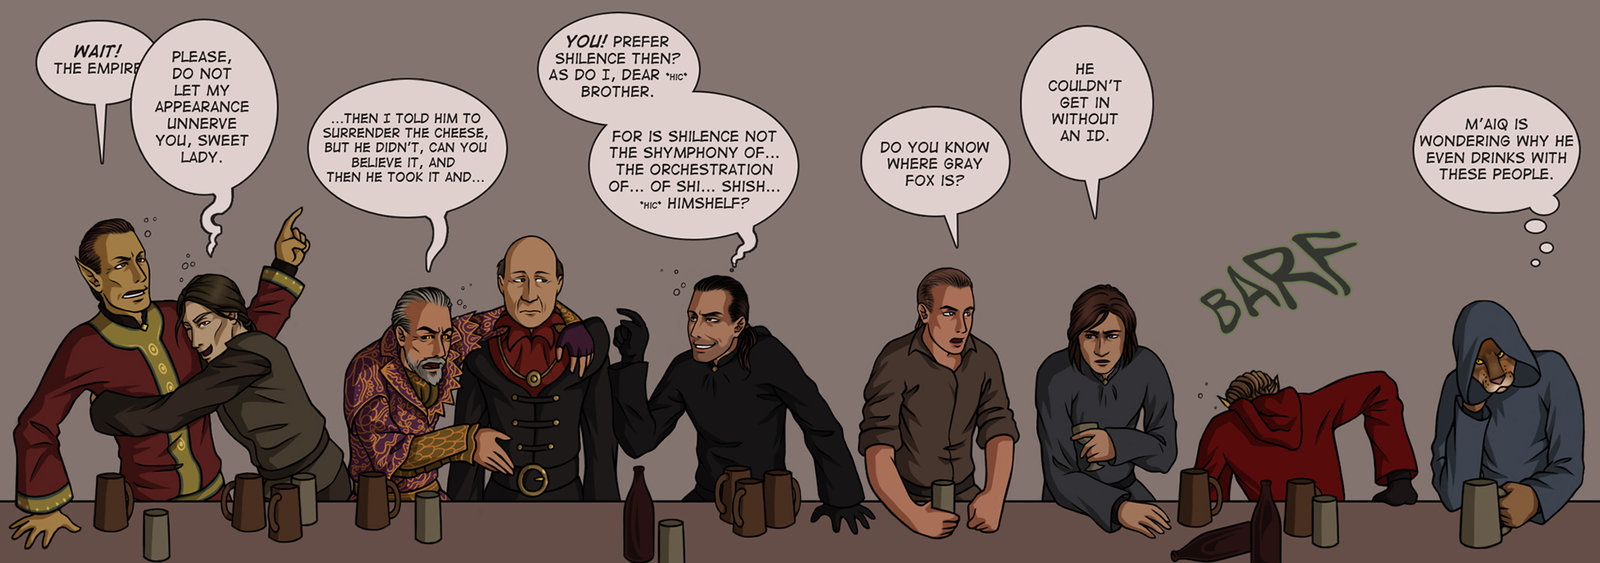 boys - The Elder Scrolls 4: Oblivion